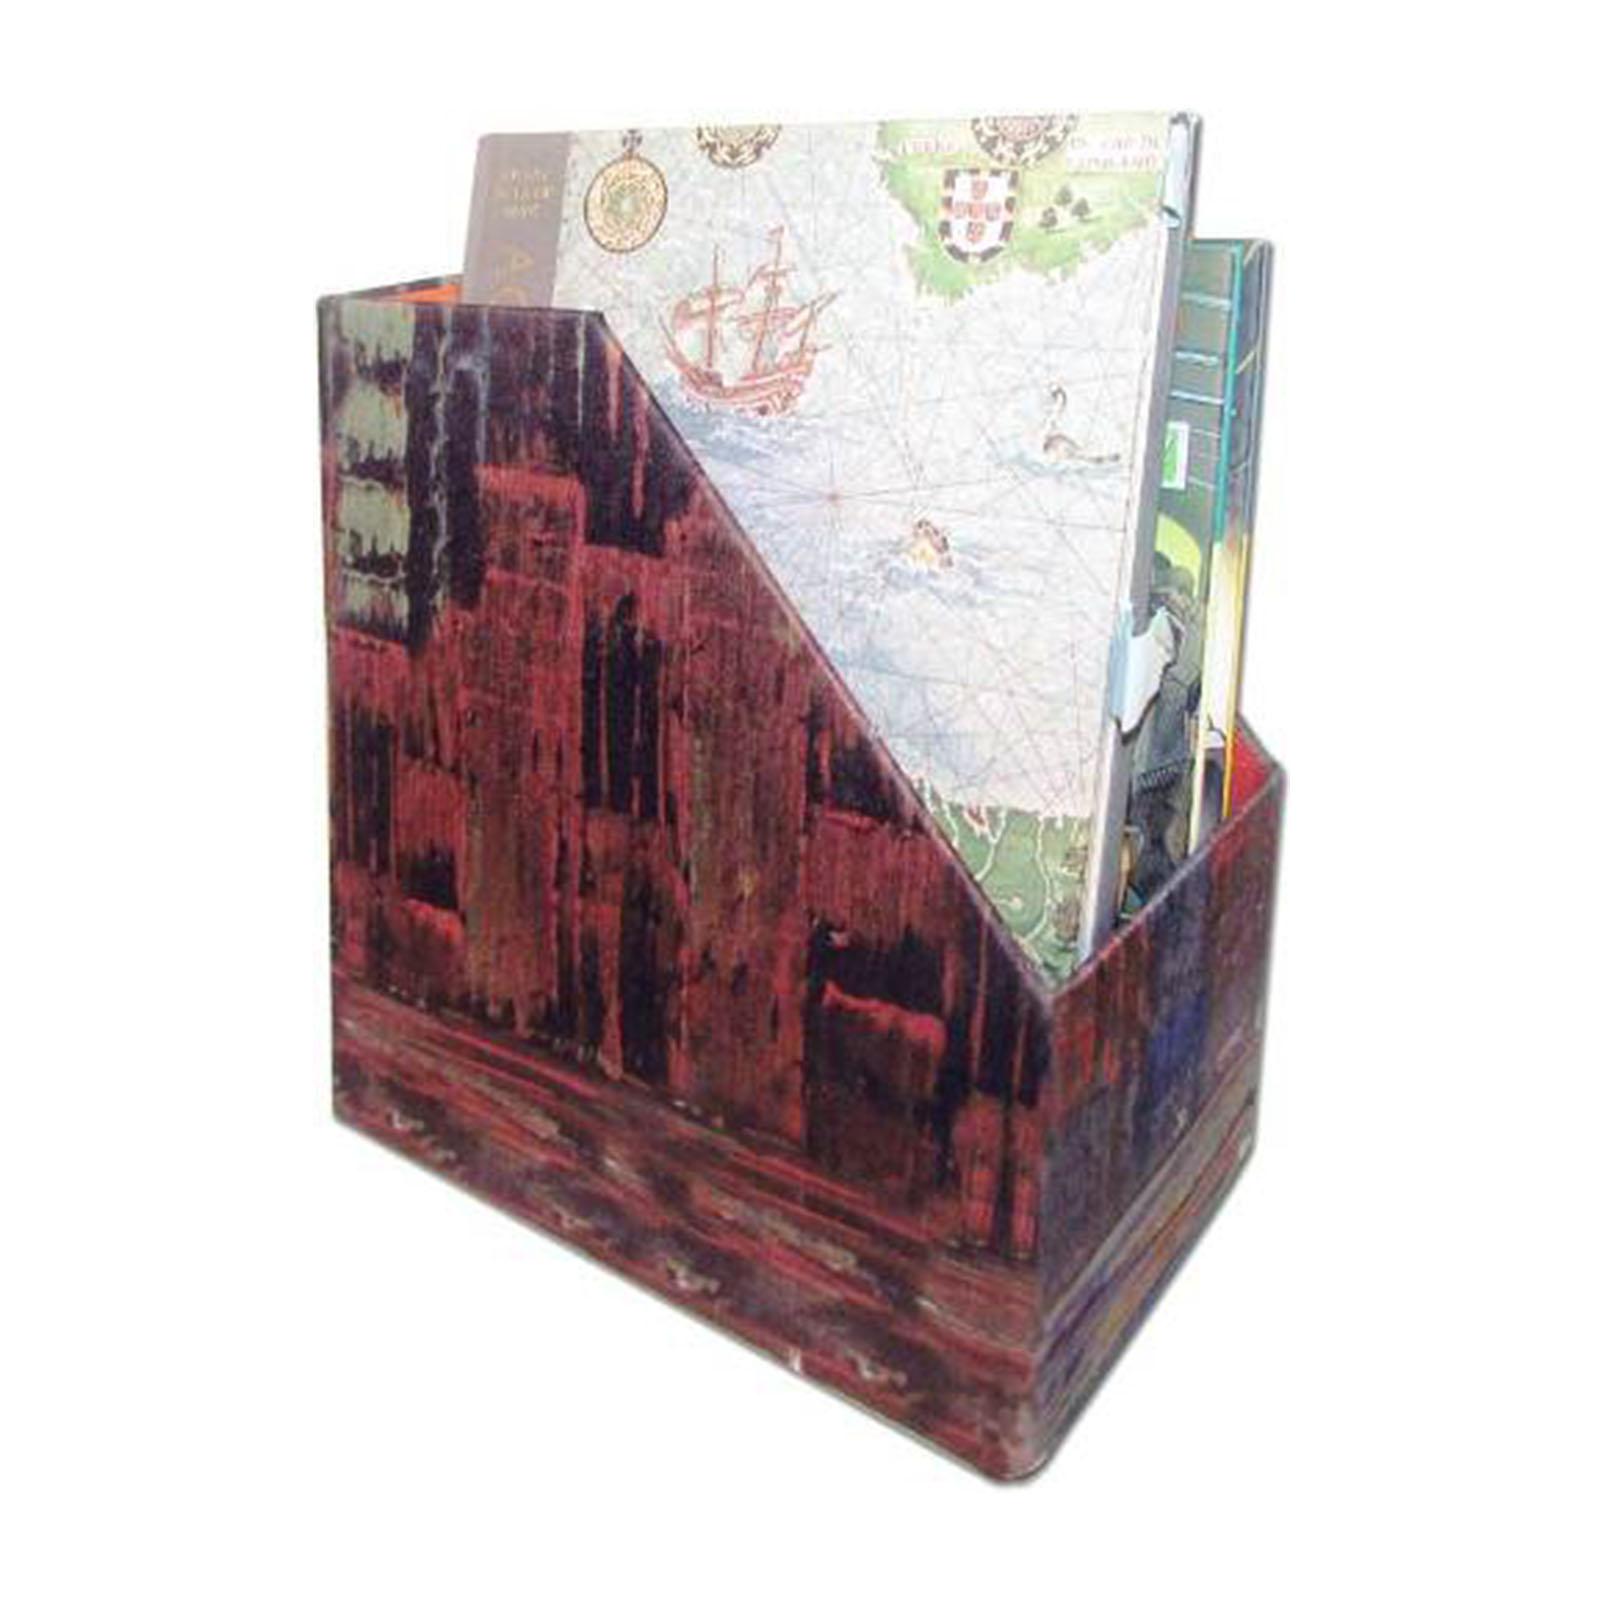 indha-multicolor-hustle-bustle-print-table-top-bookes-magazine-original-imaetgszaxwyyvsh